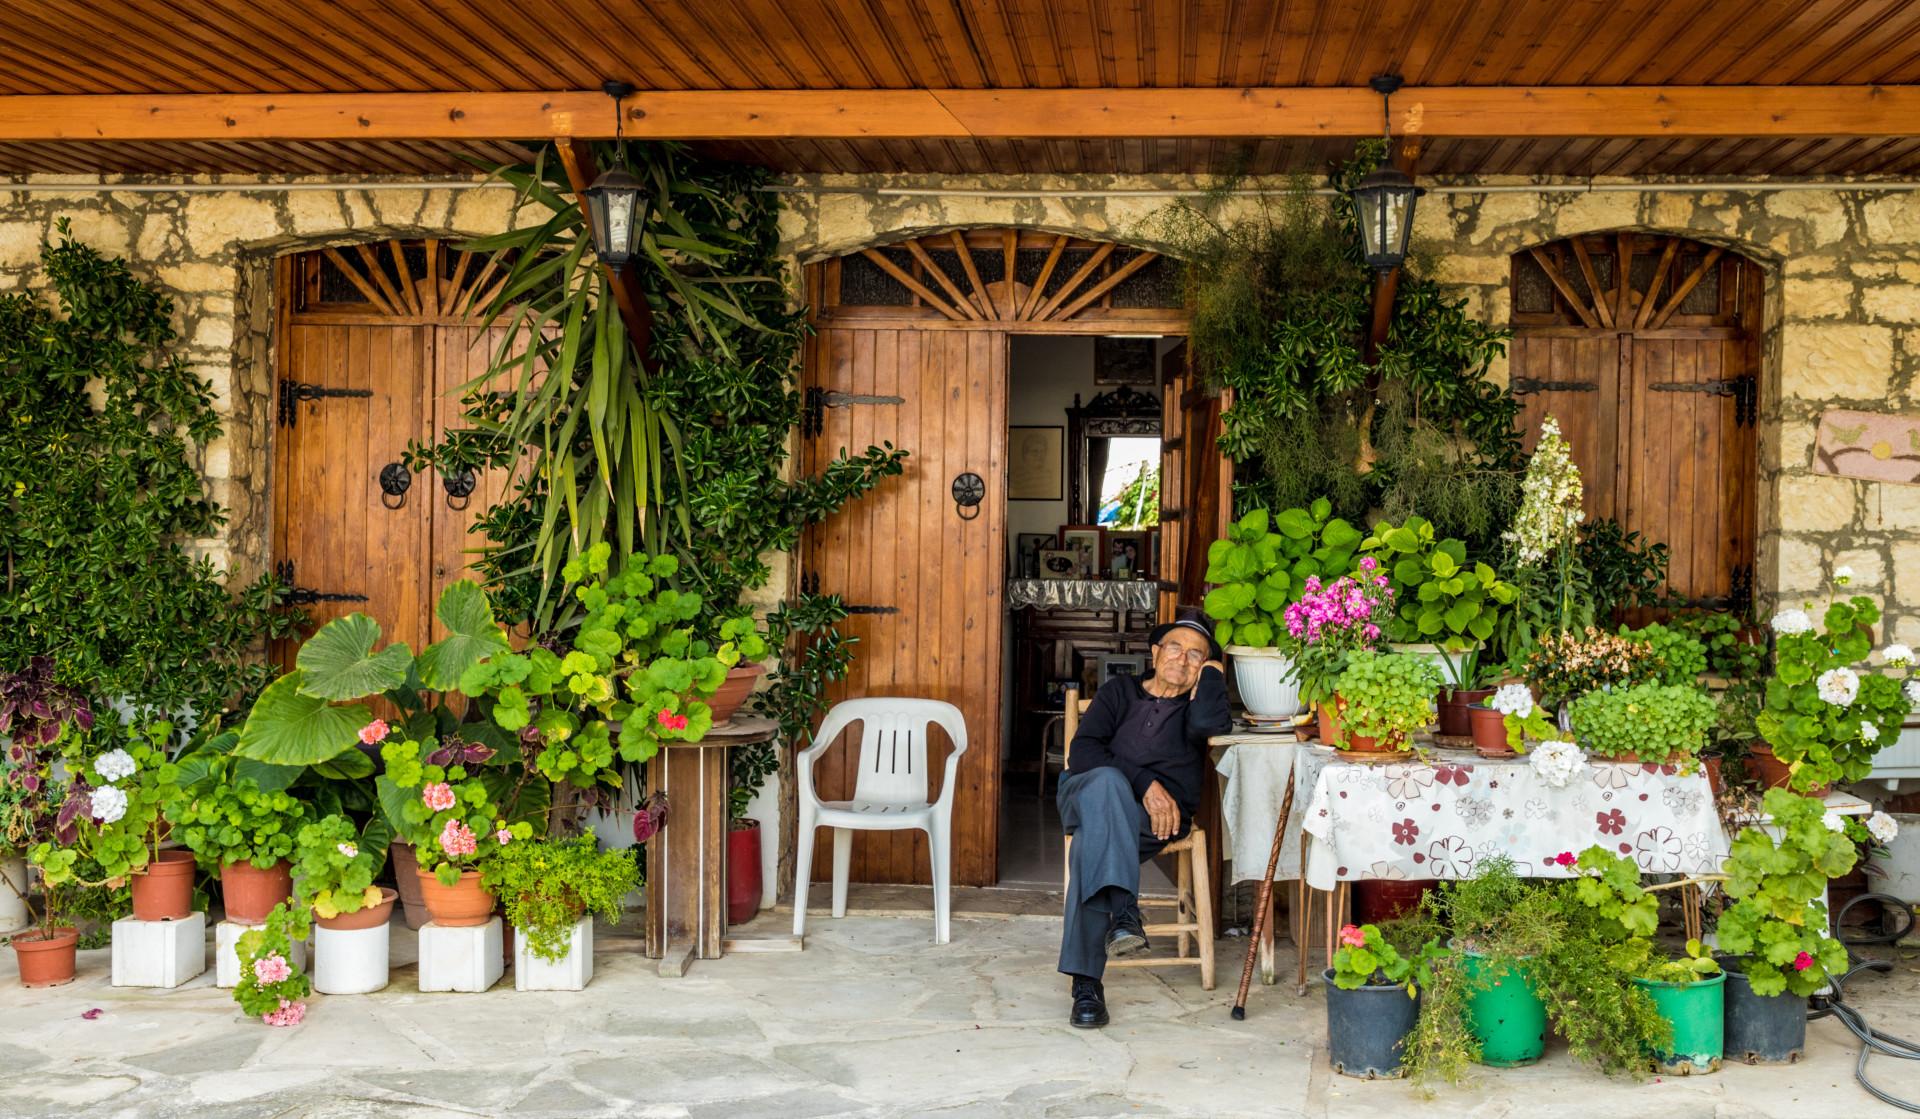 Local in Omodos, Cyprus